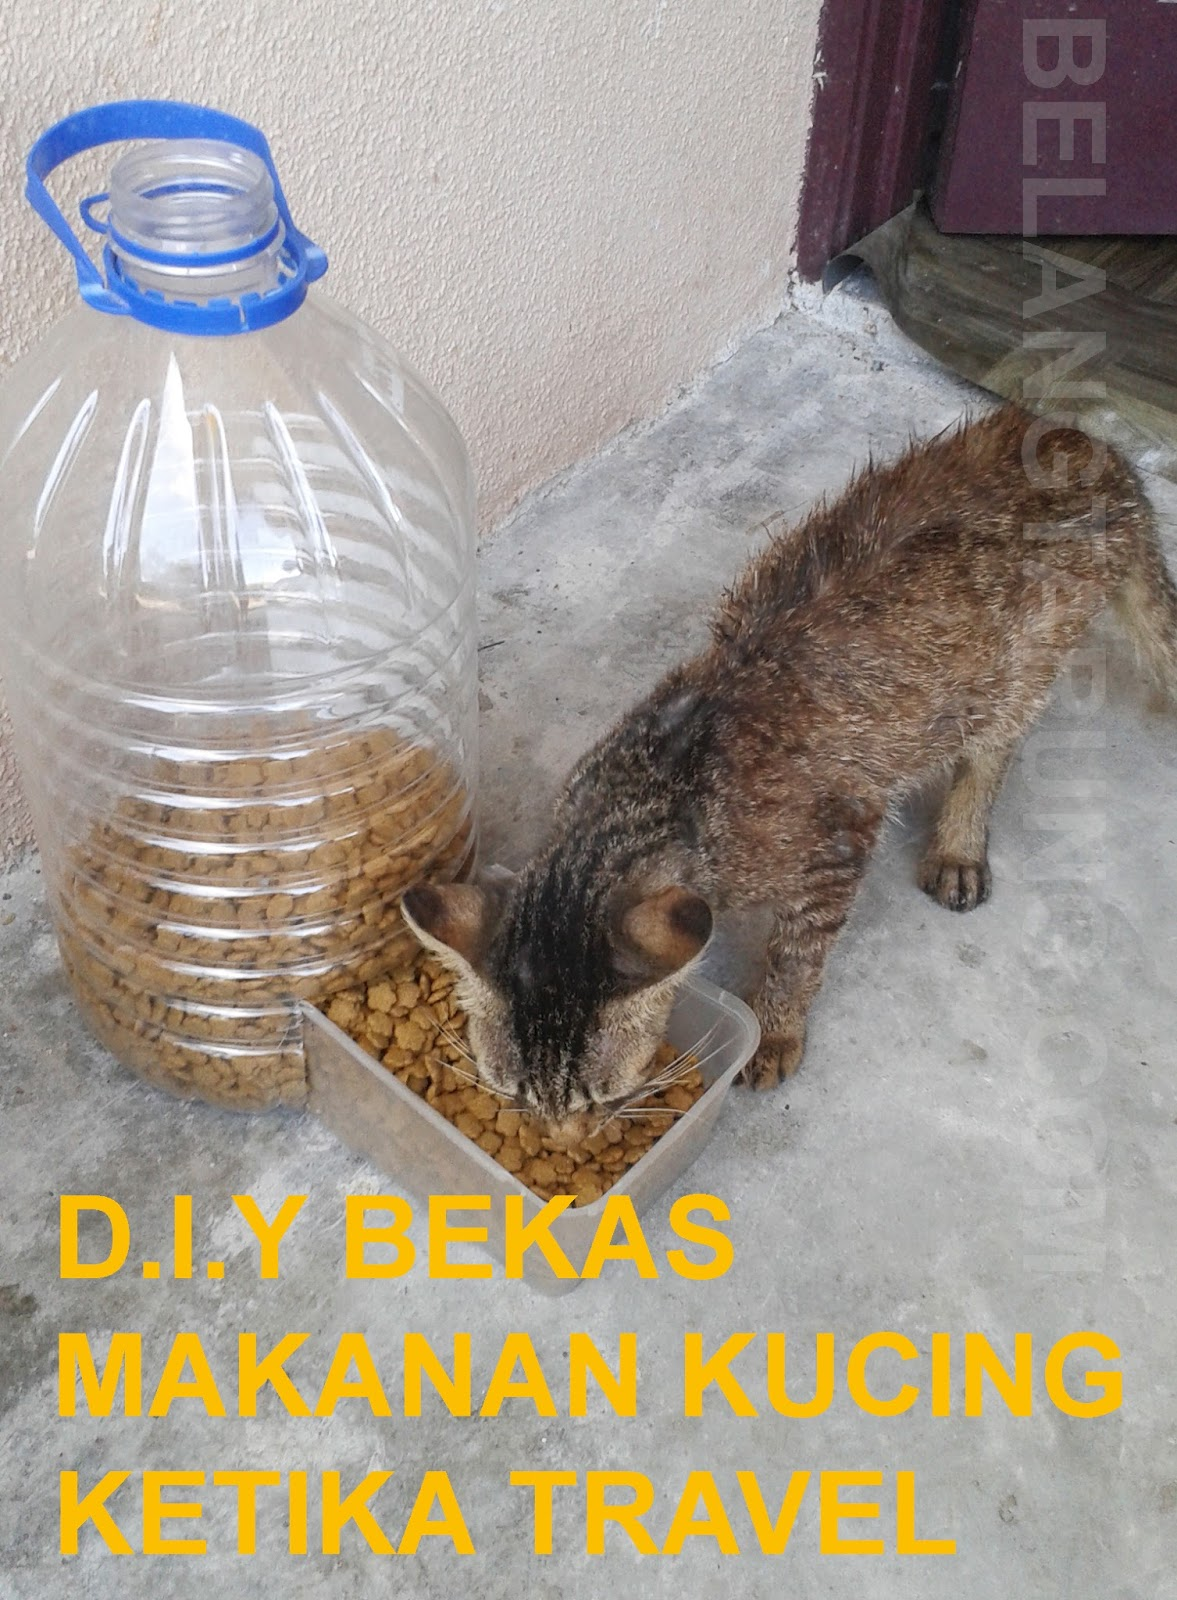 Cara Buat Bekas Makanan Kucing Automatik D I Y Travel Eat